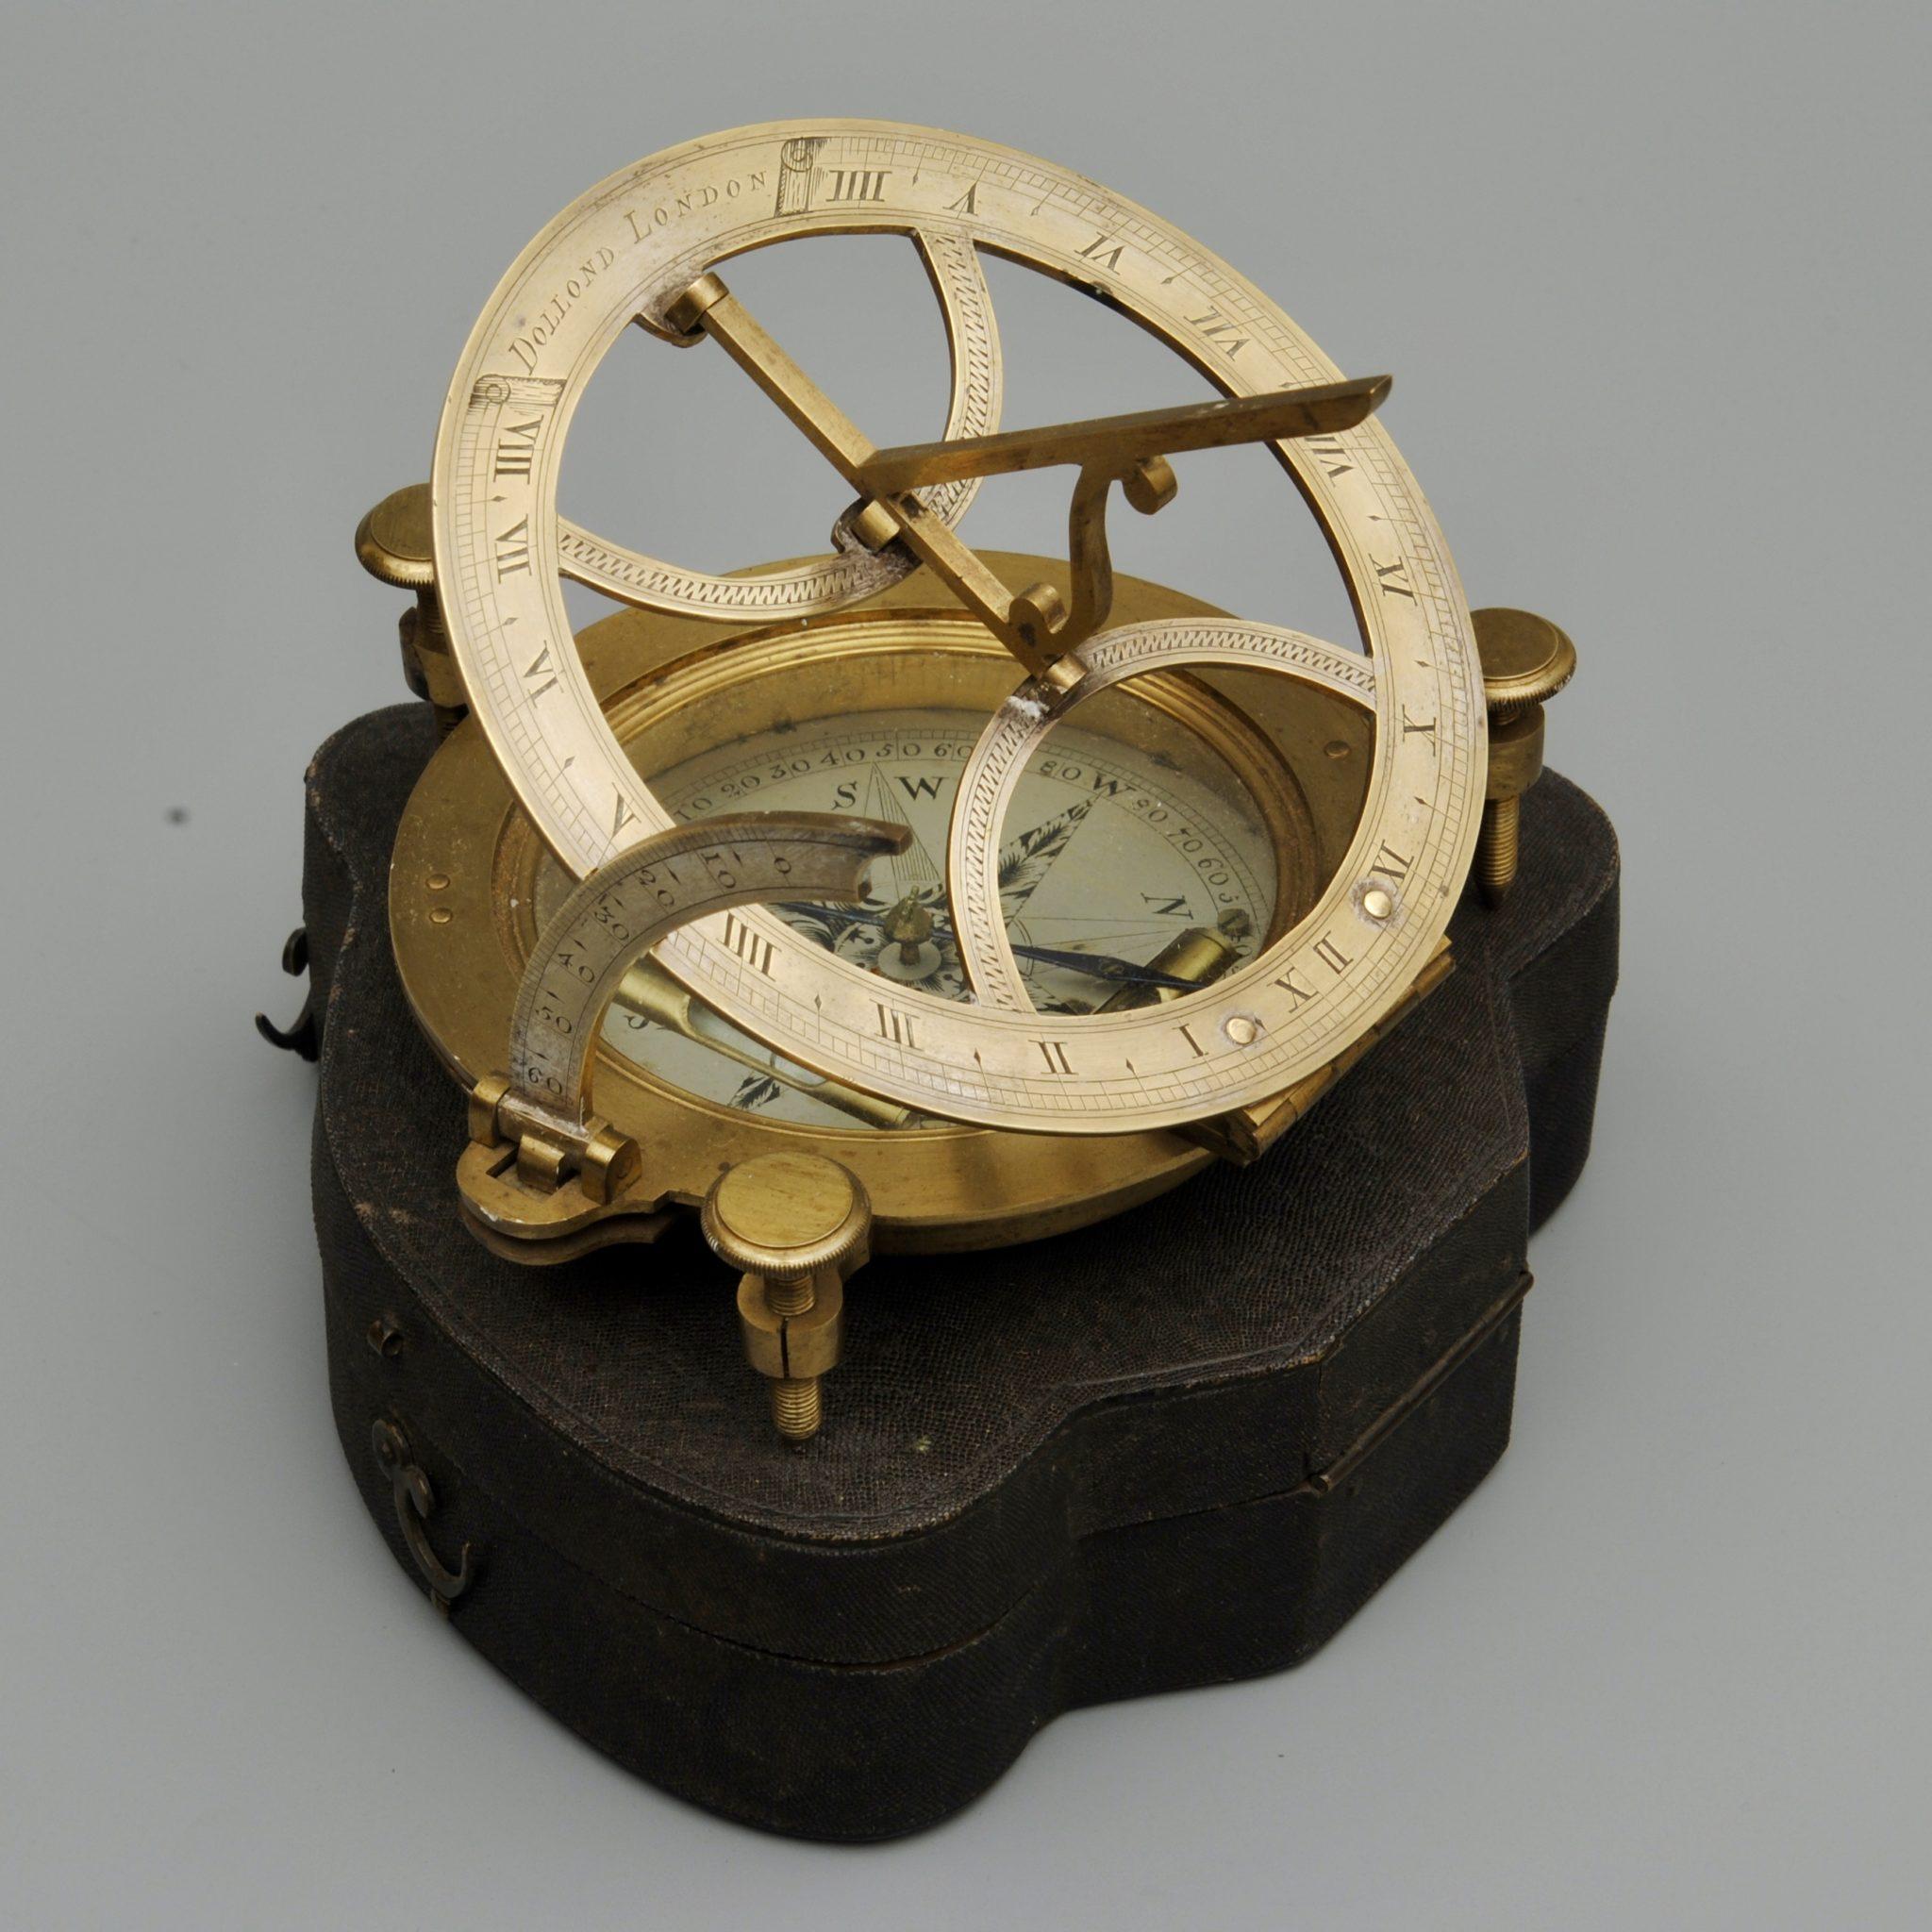 Dolland universal equinoctial sundial